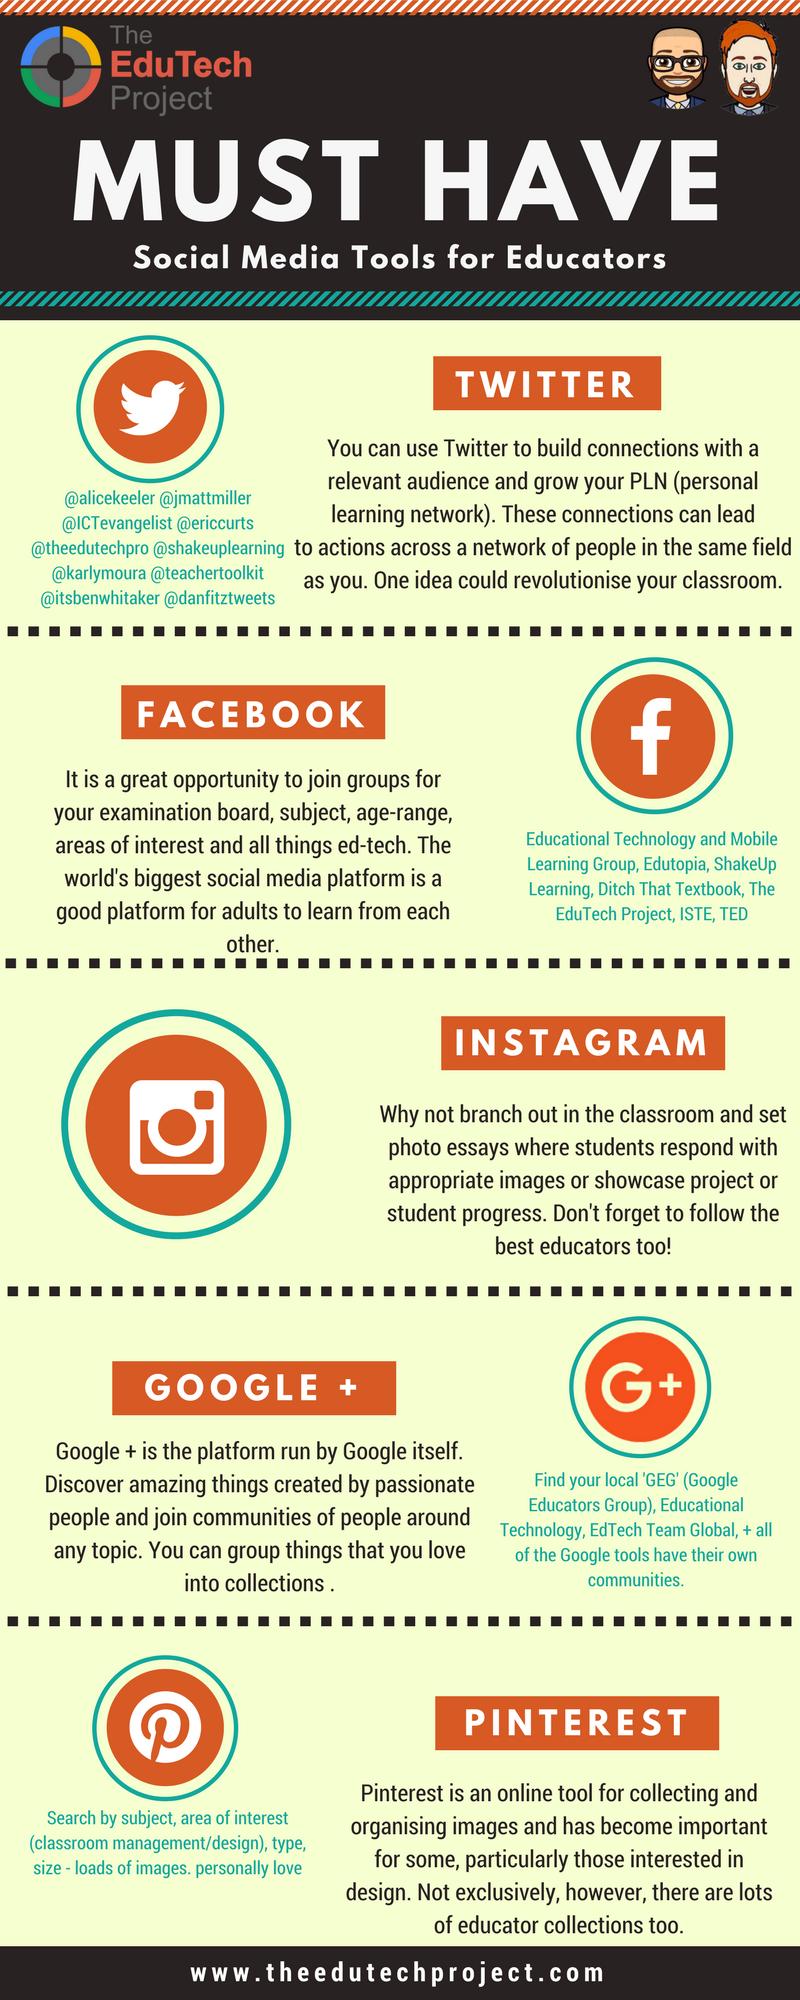 Must Have Social Media Tools for Educators